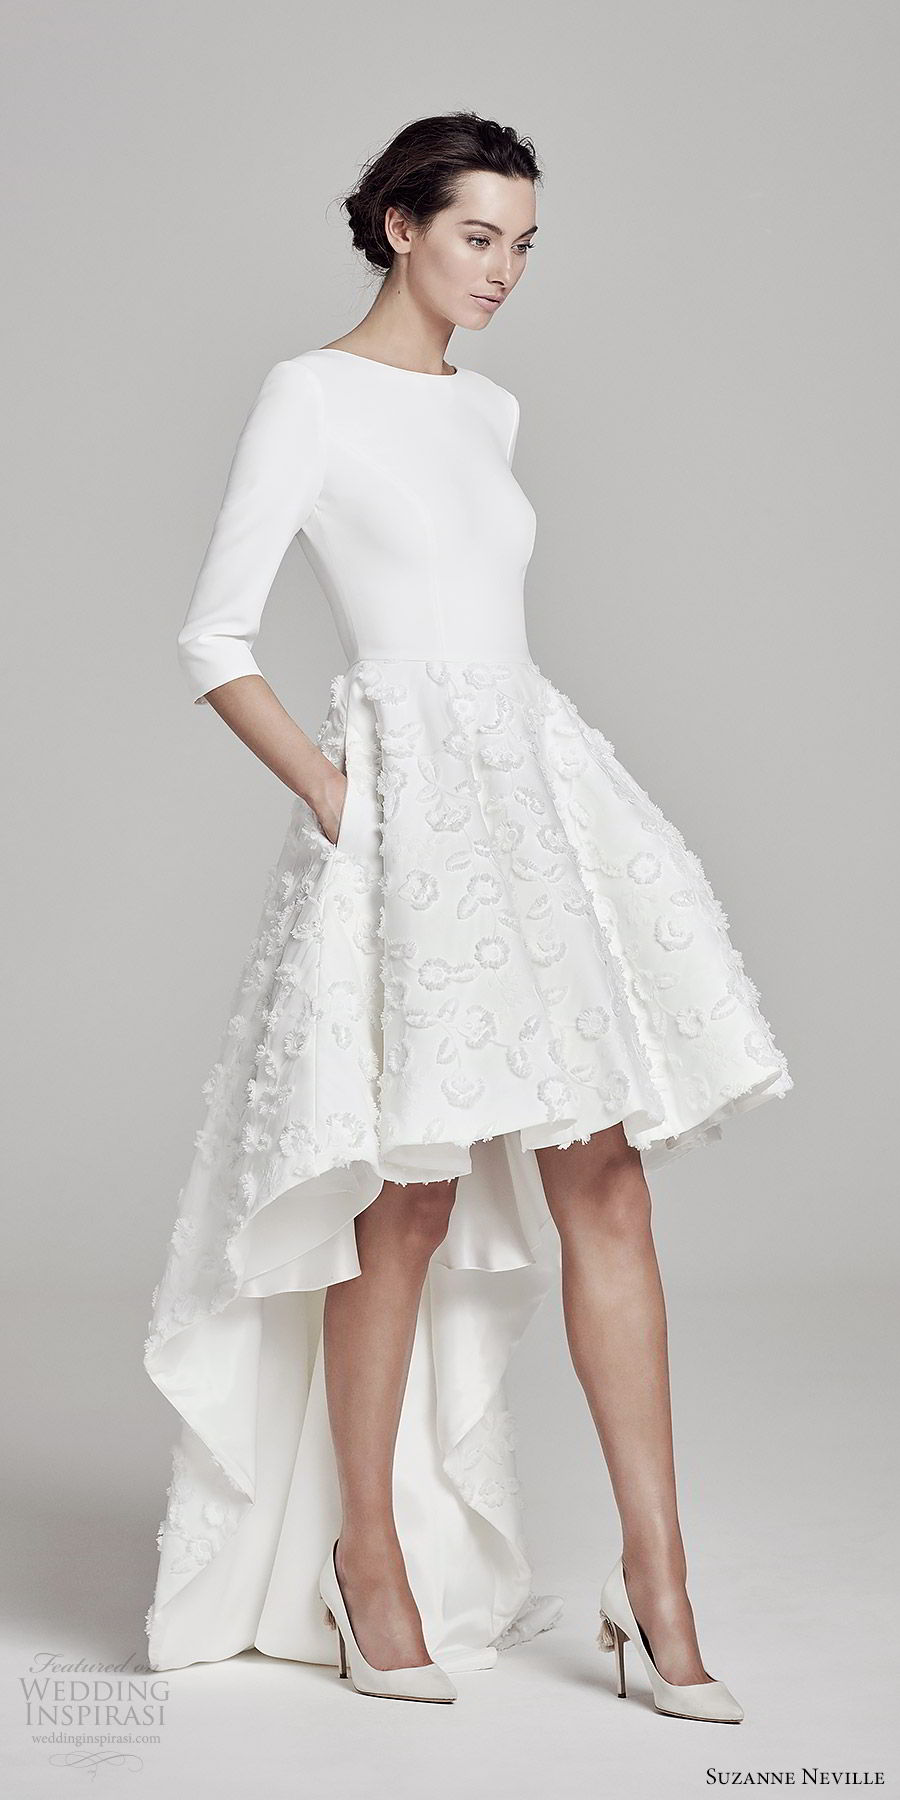 suzanne neville bridal 2019 3 quarter sleeves jewel neck clean bodice high low embellished skirt a line wedding dress (orwell) chic modern mv